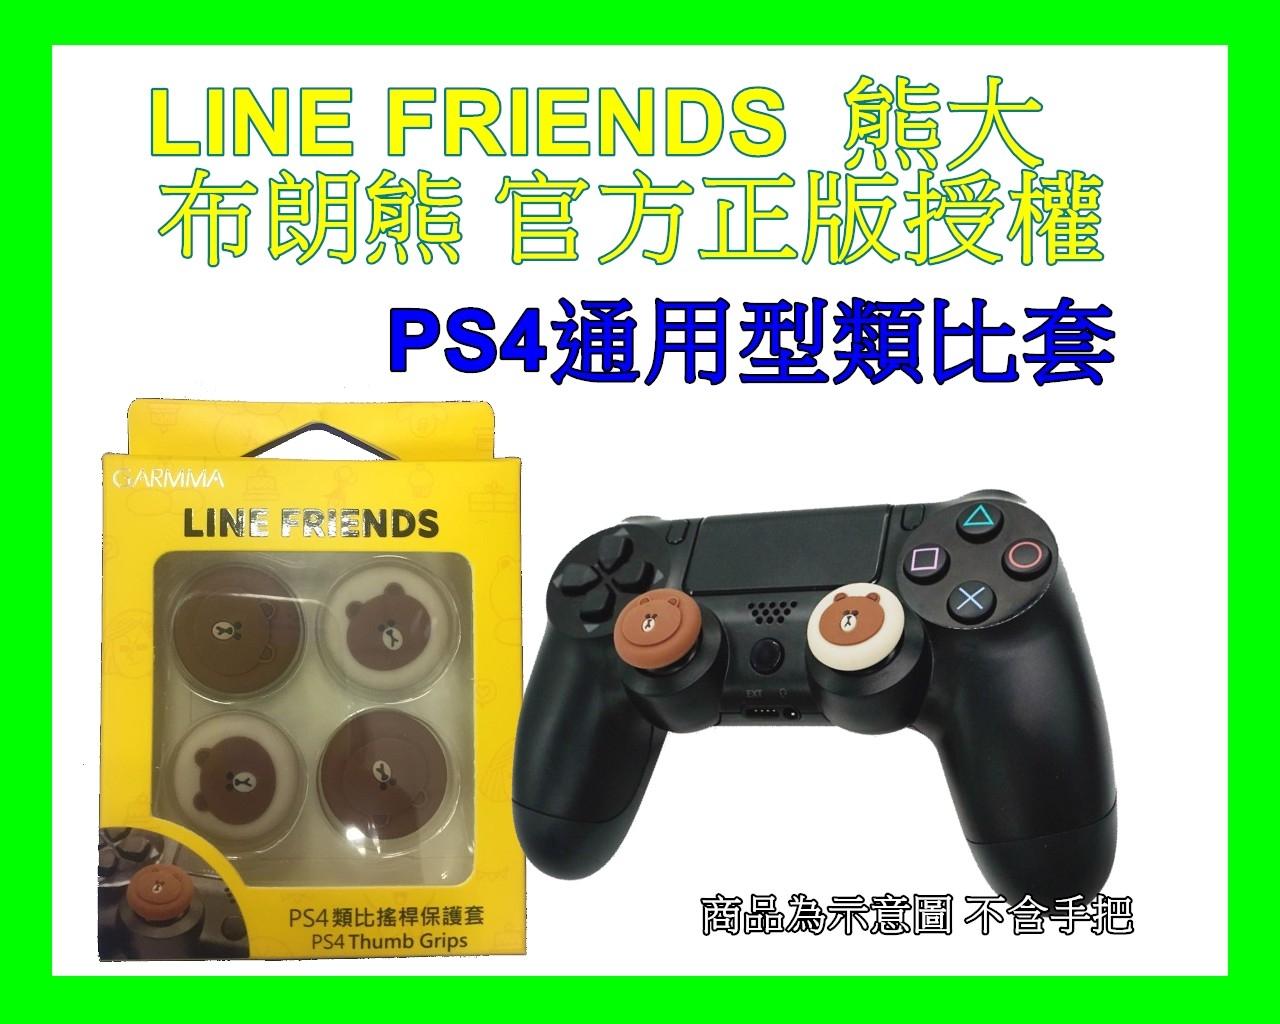 PS4 LINE FRIENDS布朗熊正版授權熊大手把類比搖桿保護套類比套臺灣公司貨仿冒必究玩樂小熊